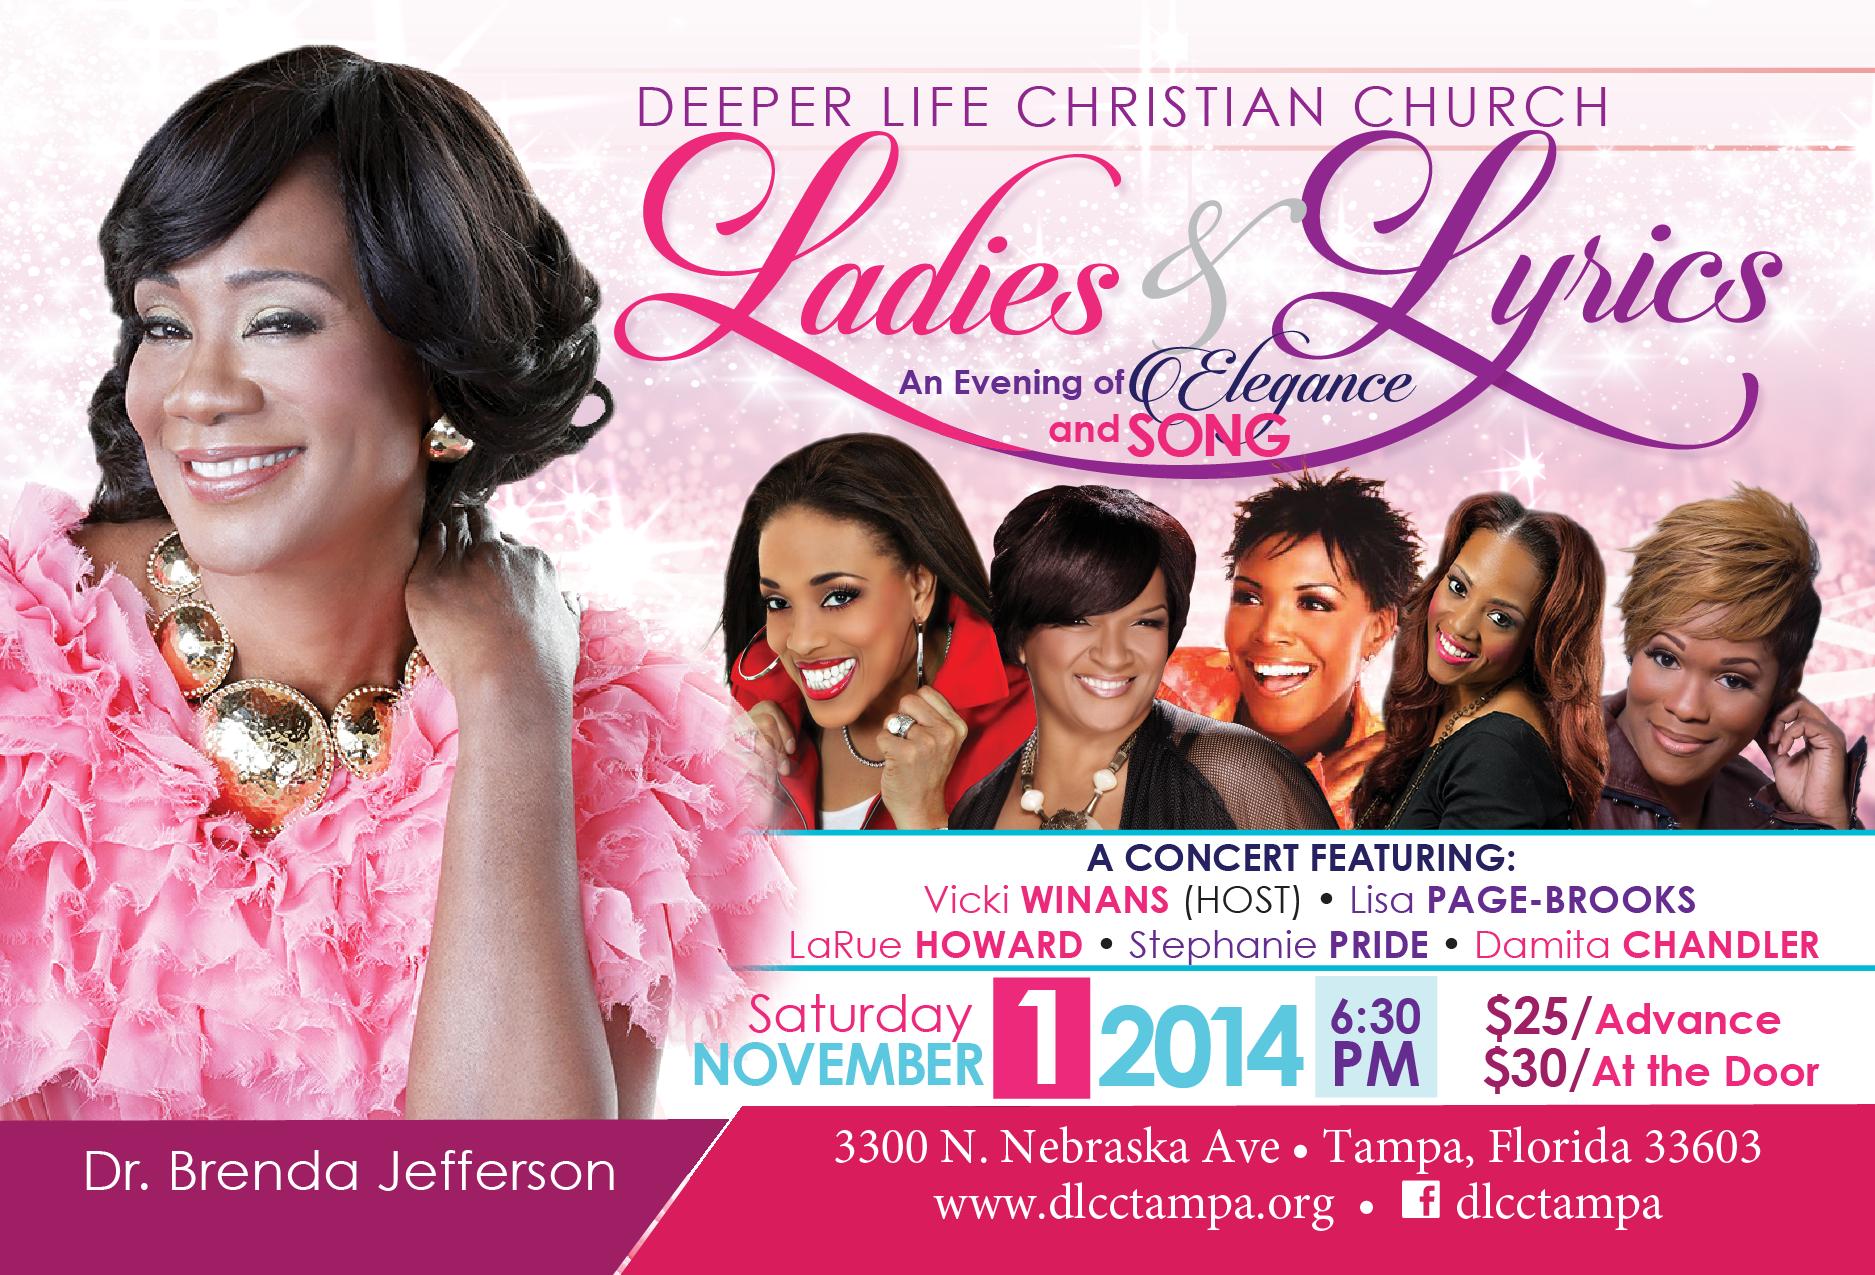 Deeper Life Christian Church 3300 N Nebraska Ave Tampa Fl 33605 Bishop M B Jefferson Dr Brenda Jefferson Website Lady Lyrics Church Events Deeper Life